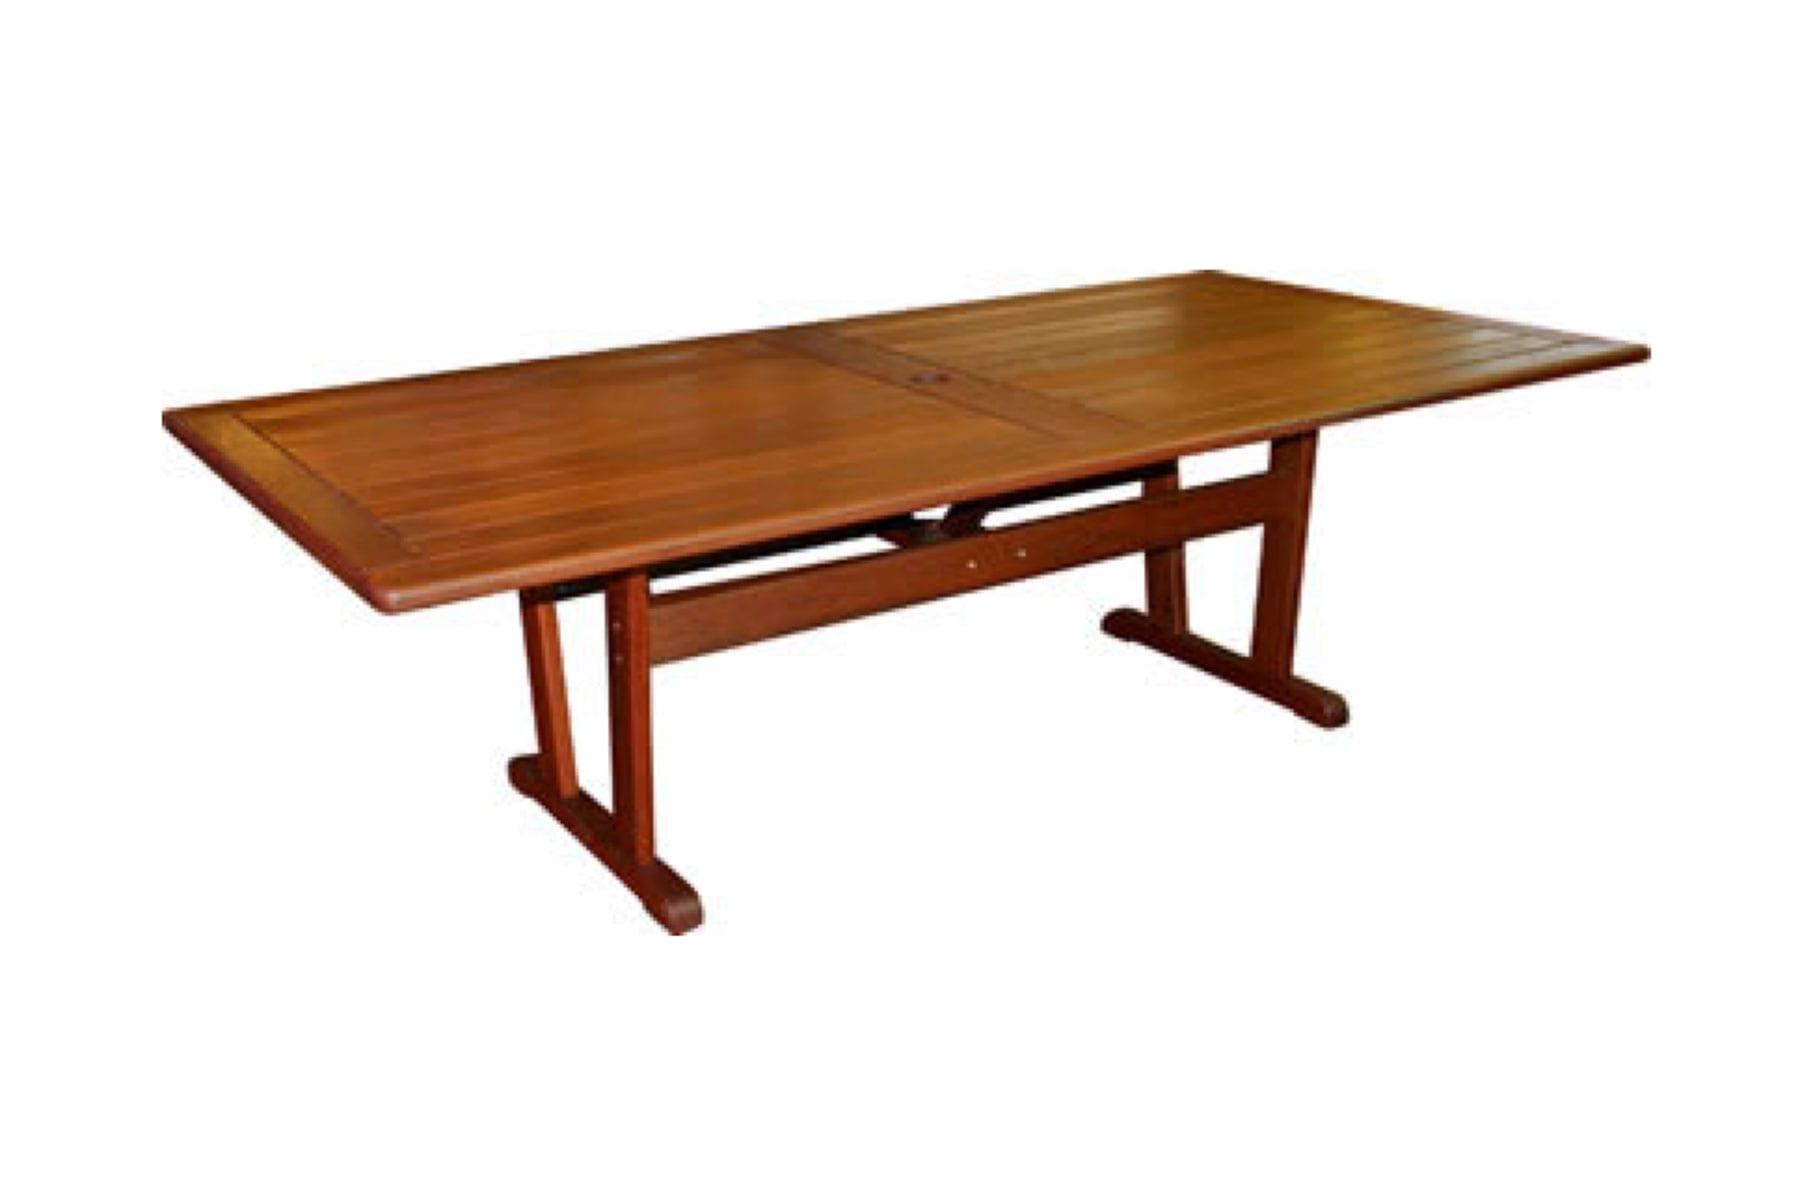 187 Devon Classic Kwila Dining Table 2200 McKenzie amp Willis : classic 2200 from mckenzieandwillis.co.nz size 1800 x 1200 jpeg 83kB